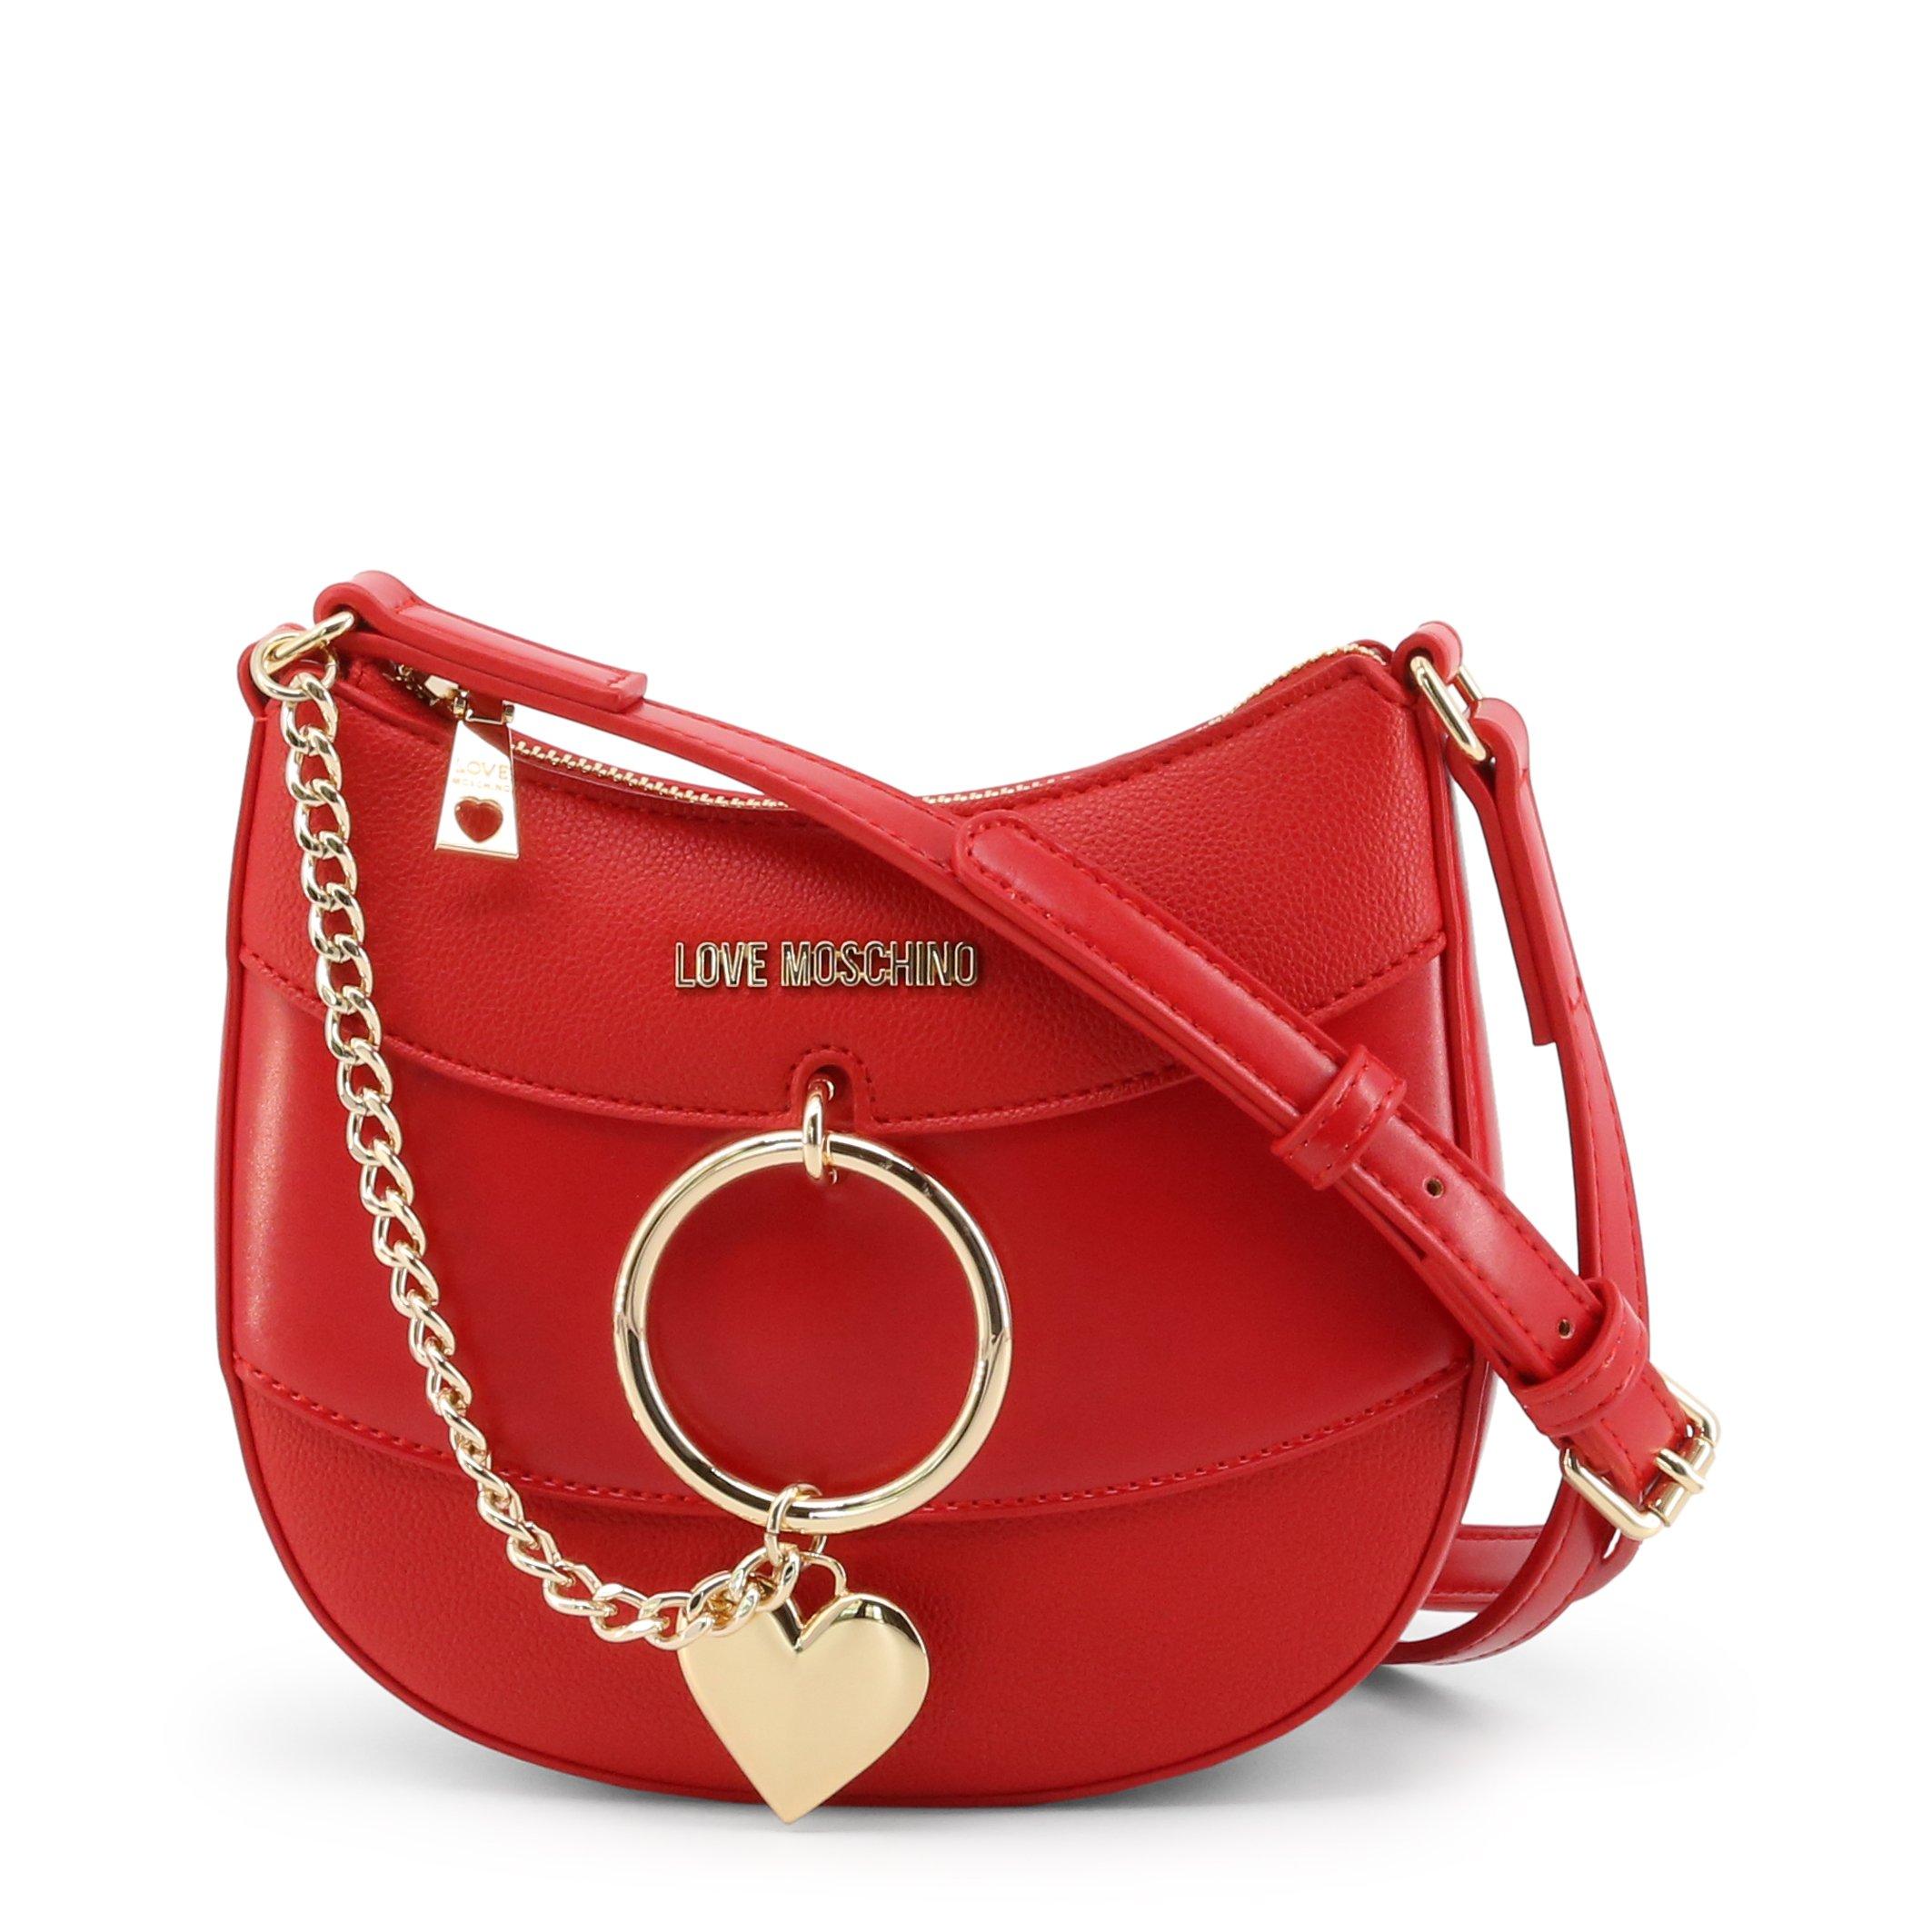 Love Moschino Women's Crossbody Bag Various Colours JC4239PP0CKF1 - red NOSIZE